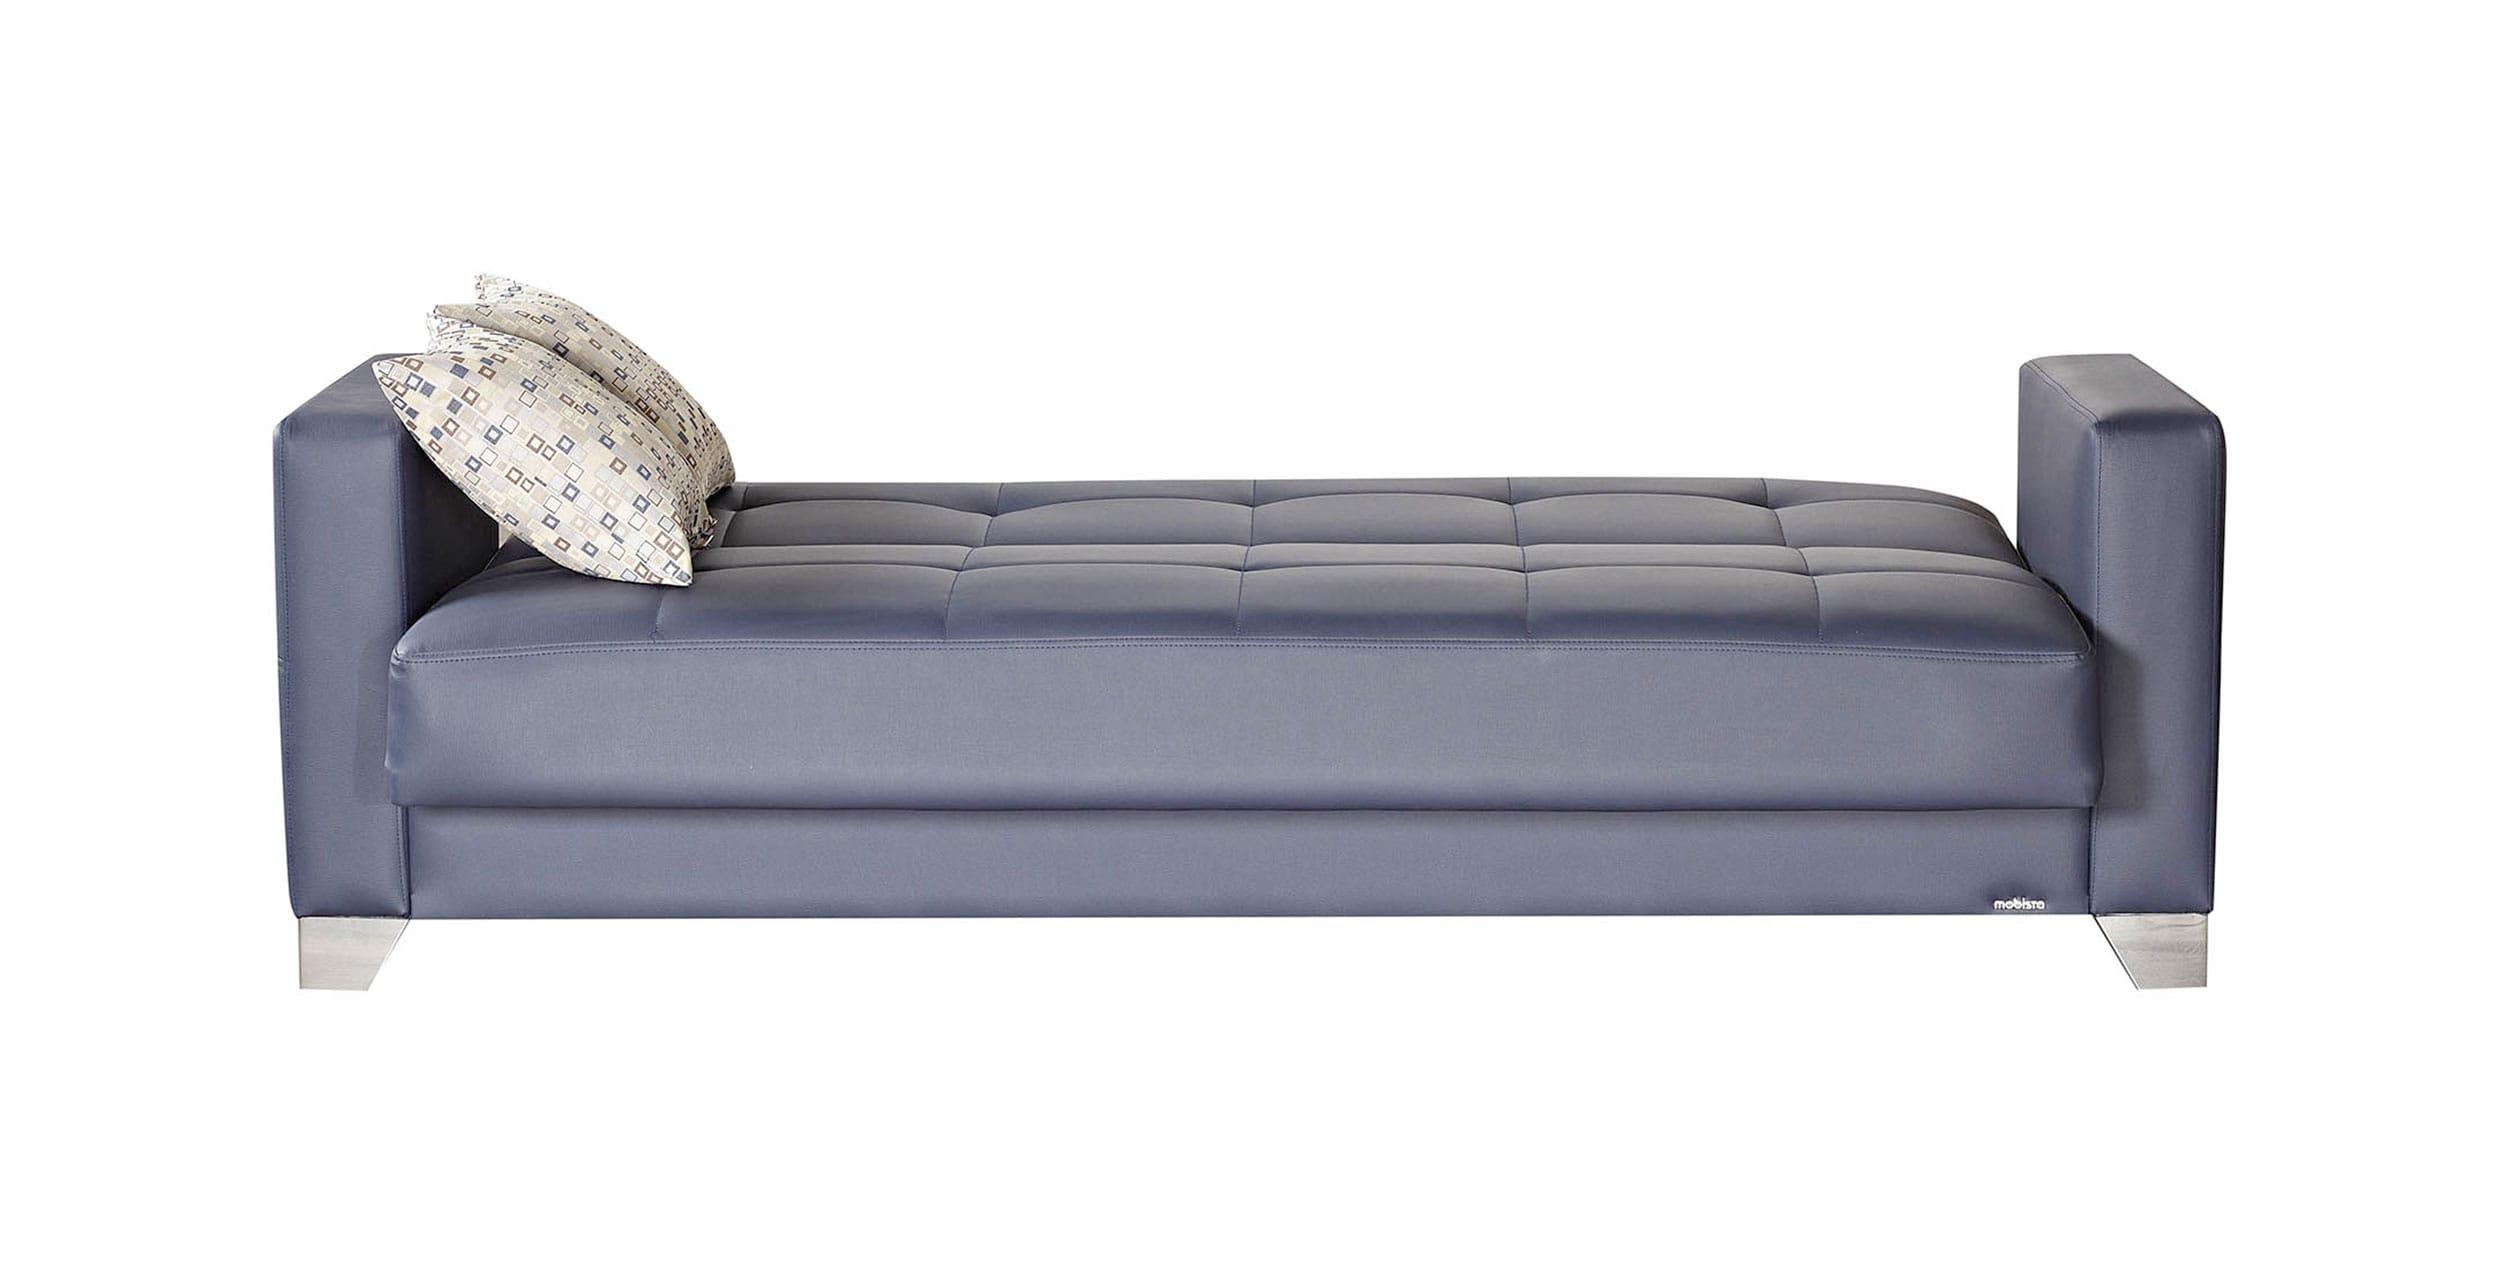 leatherette sofa durability macys bed sale viva italia prestige navy blue by mobista